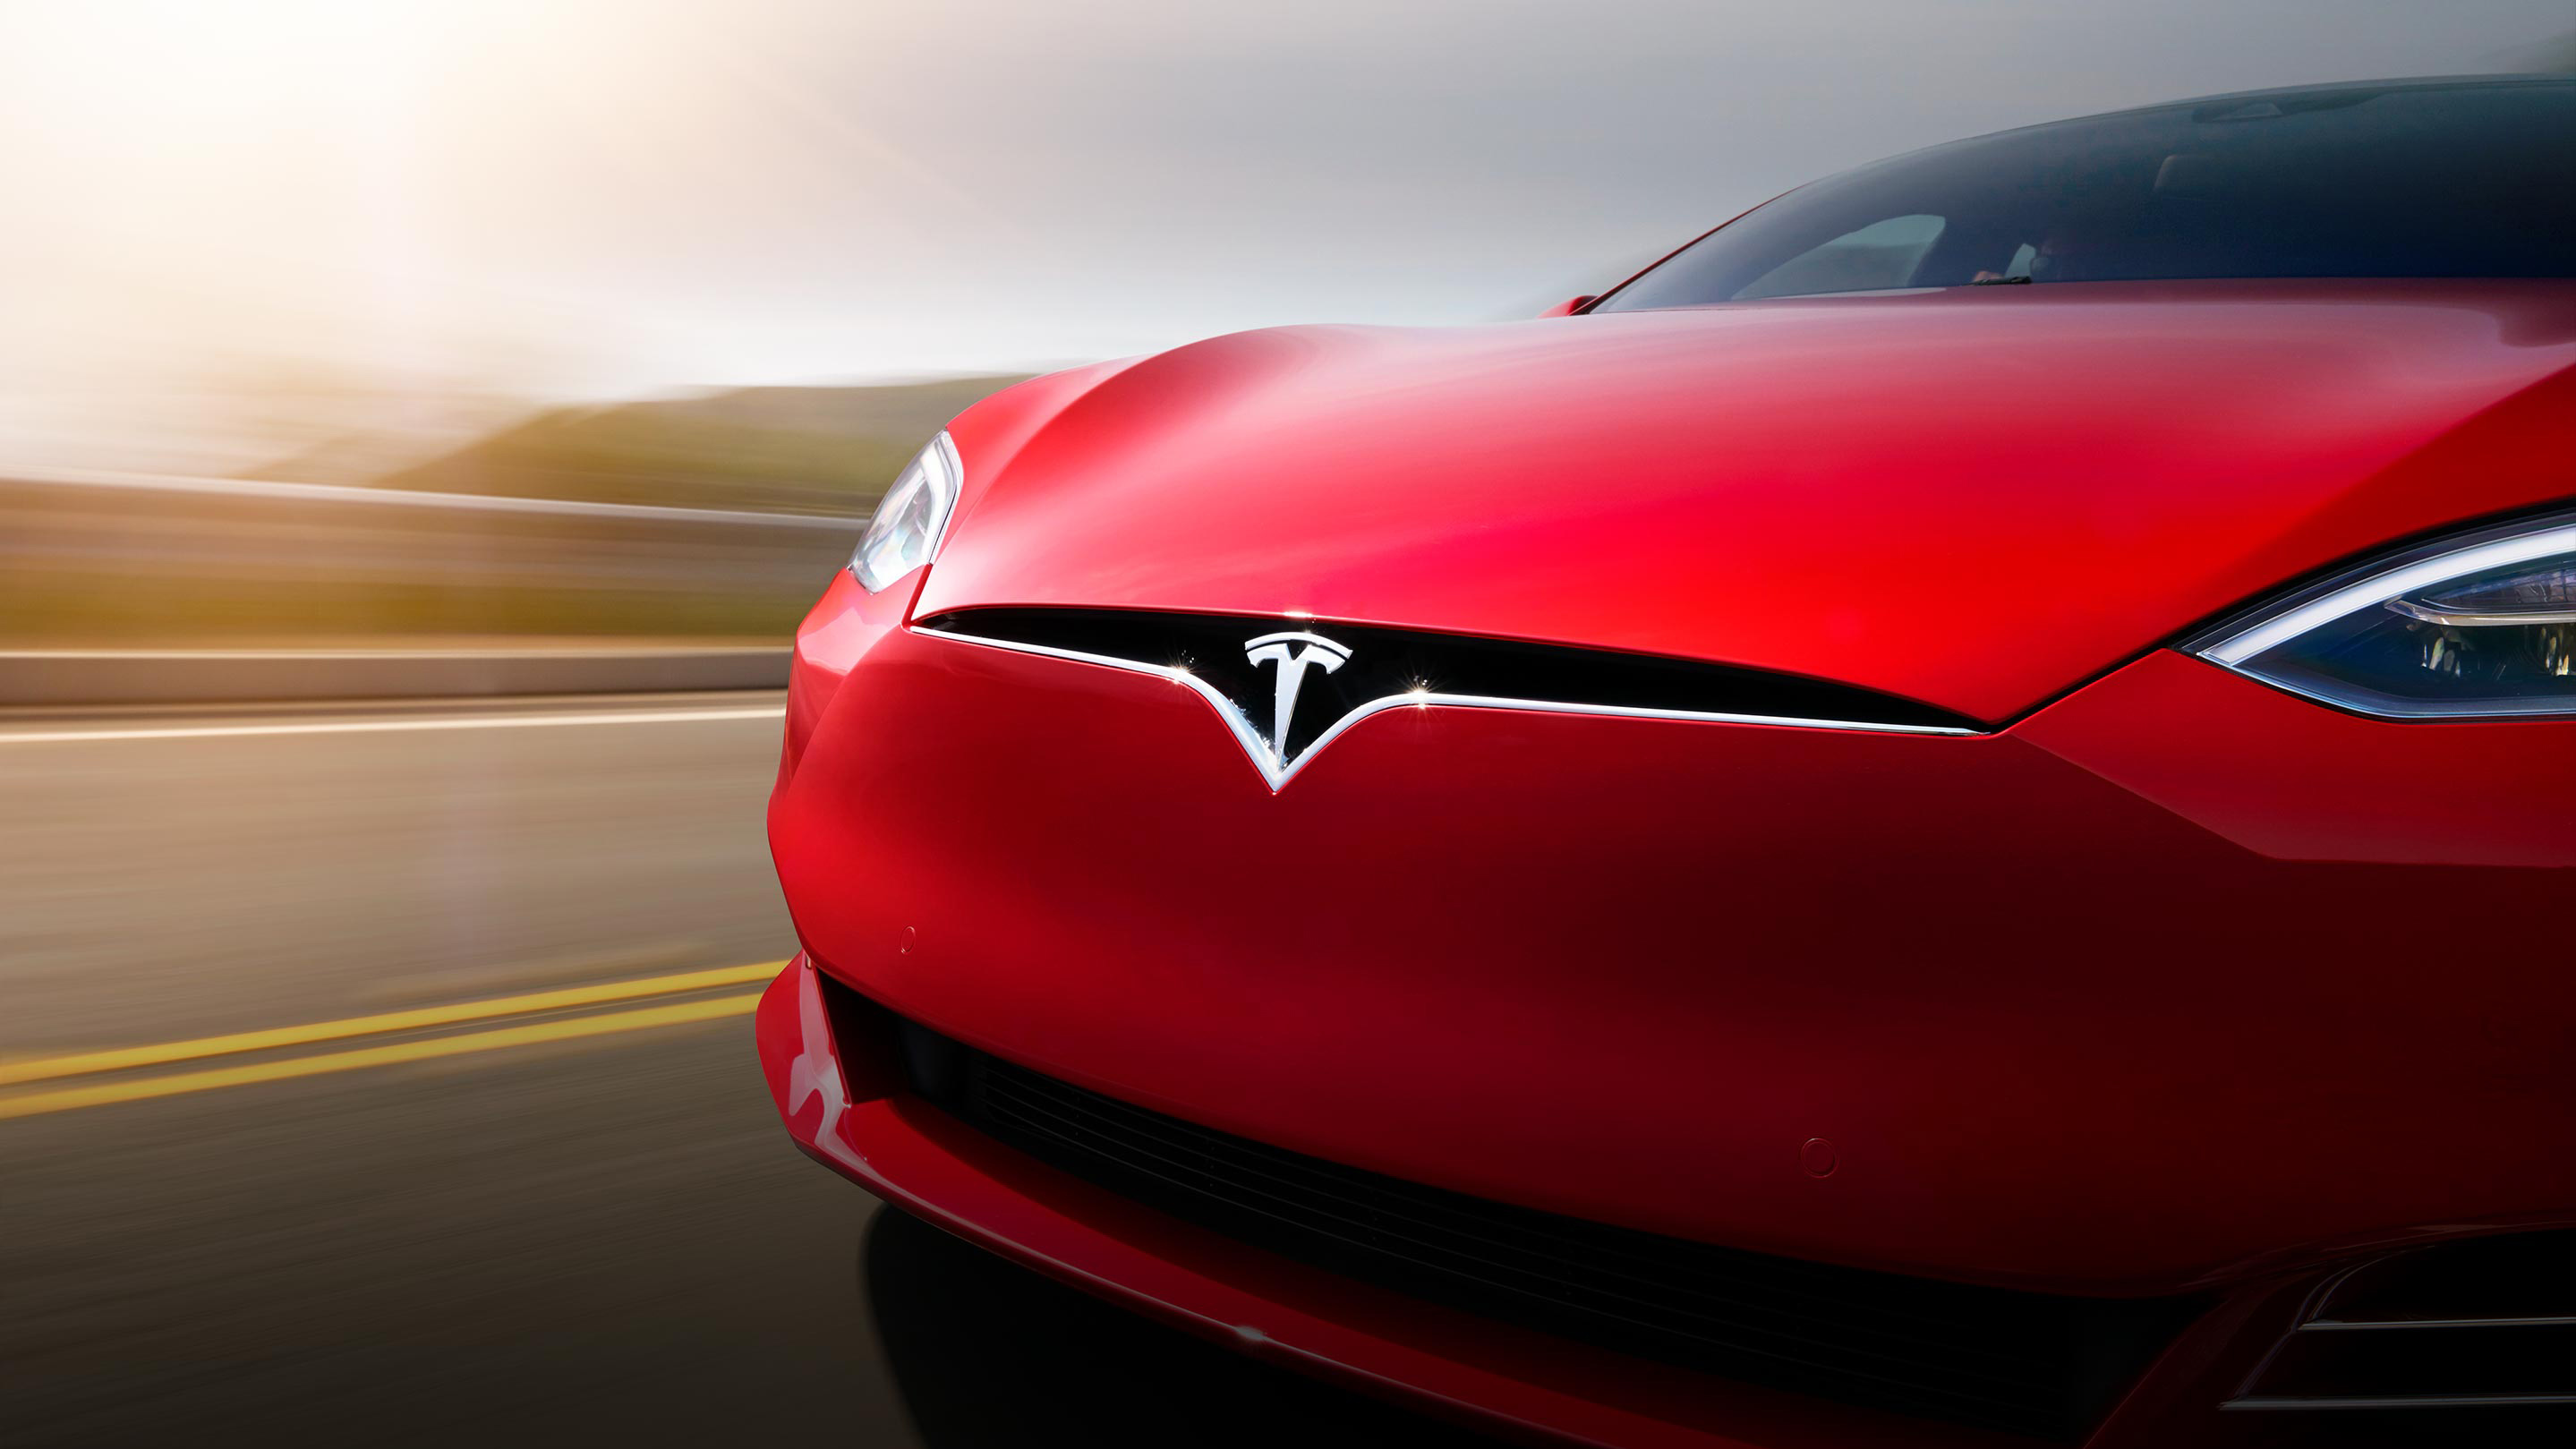 Tesla Model S 2017 Wallpaper Hd Car Wallpapers Id 7349